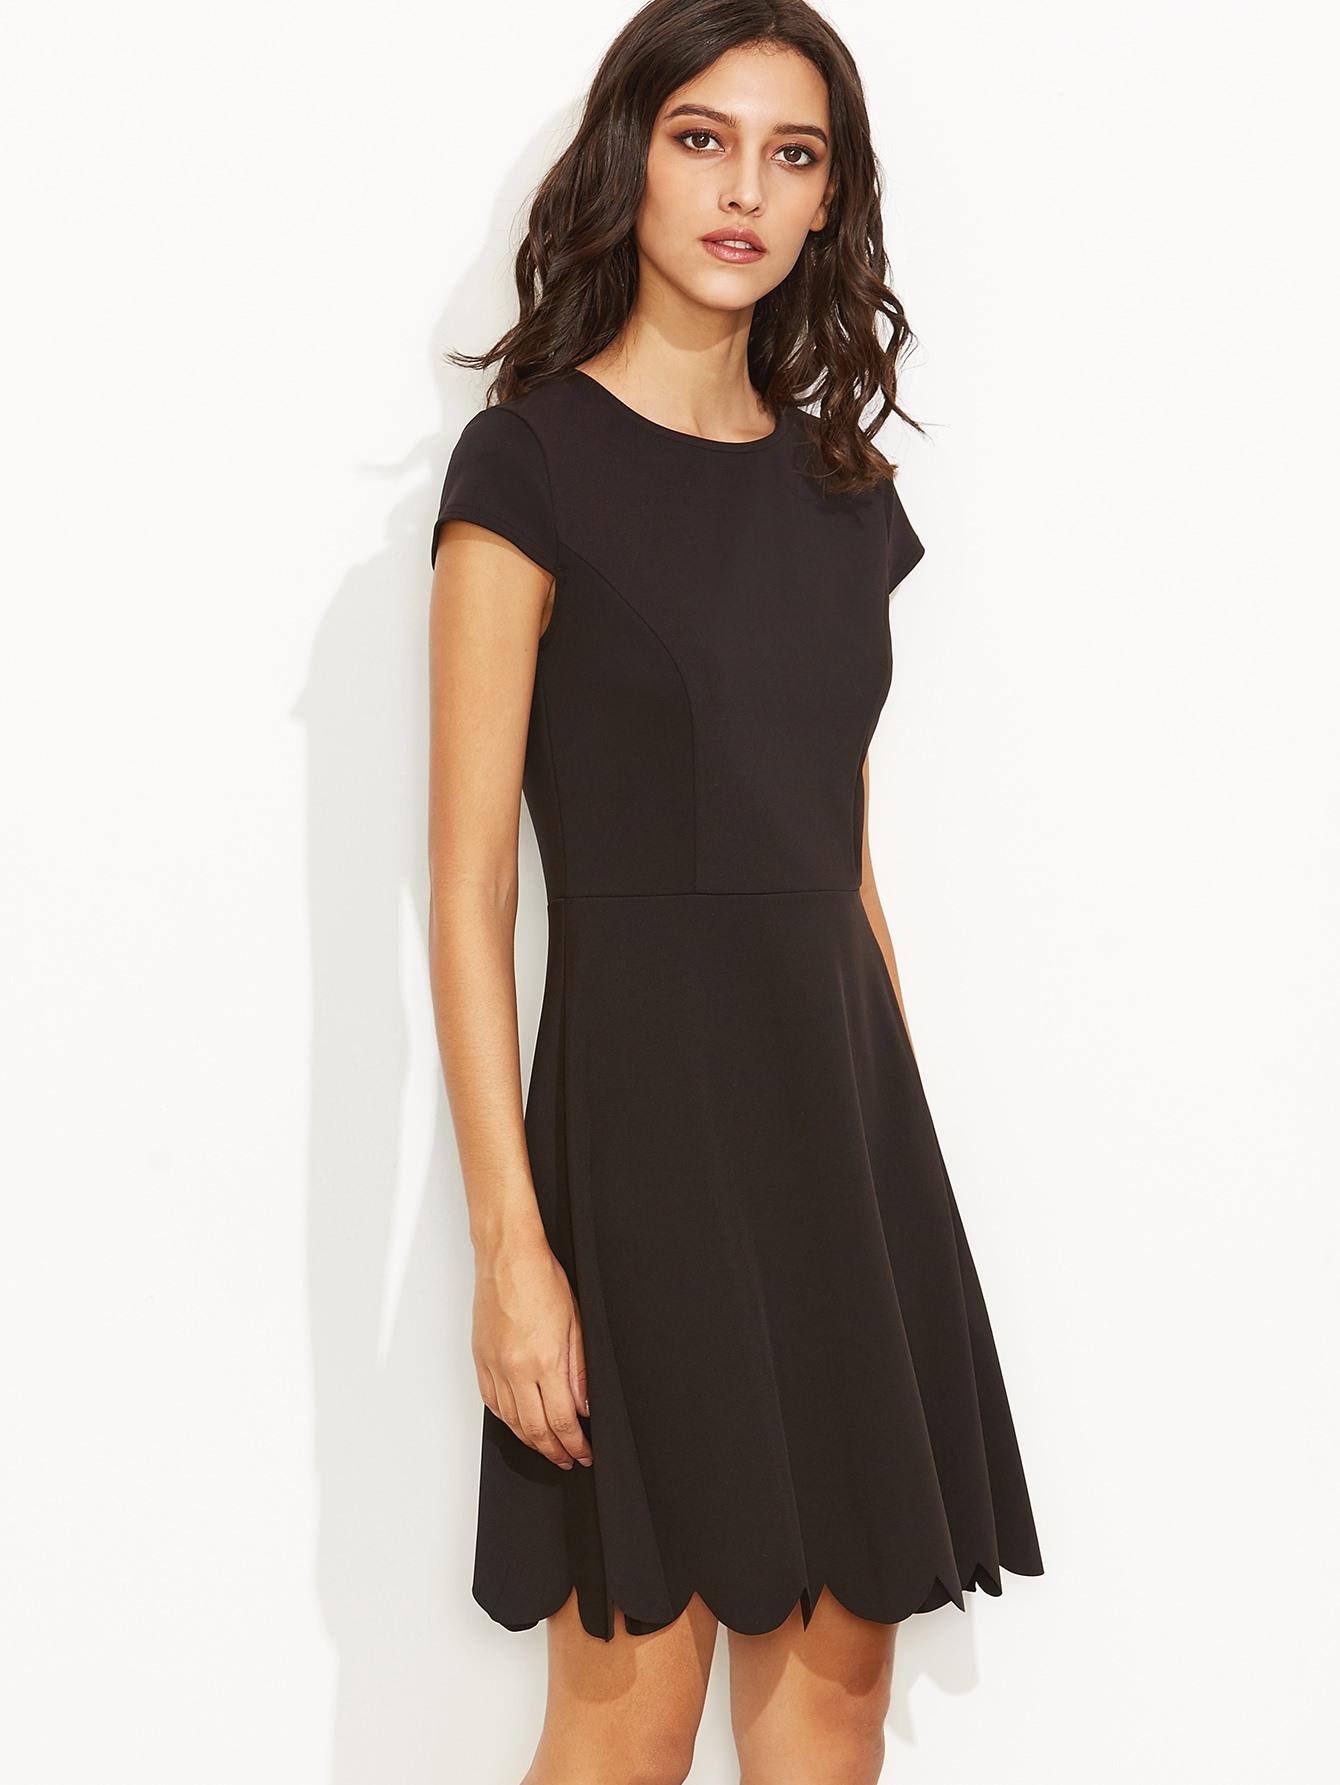 Luxurius Elegante Kleider Kurz SpezialgebietAbend Perfekt Elegante Kleider Kurz Spezialgebiet